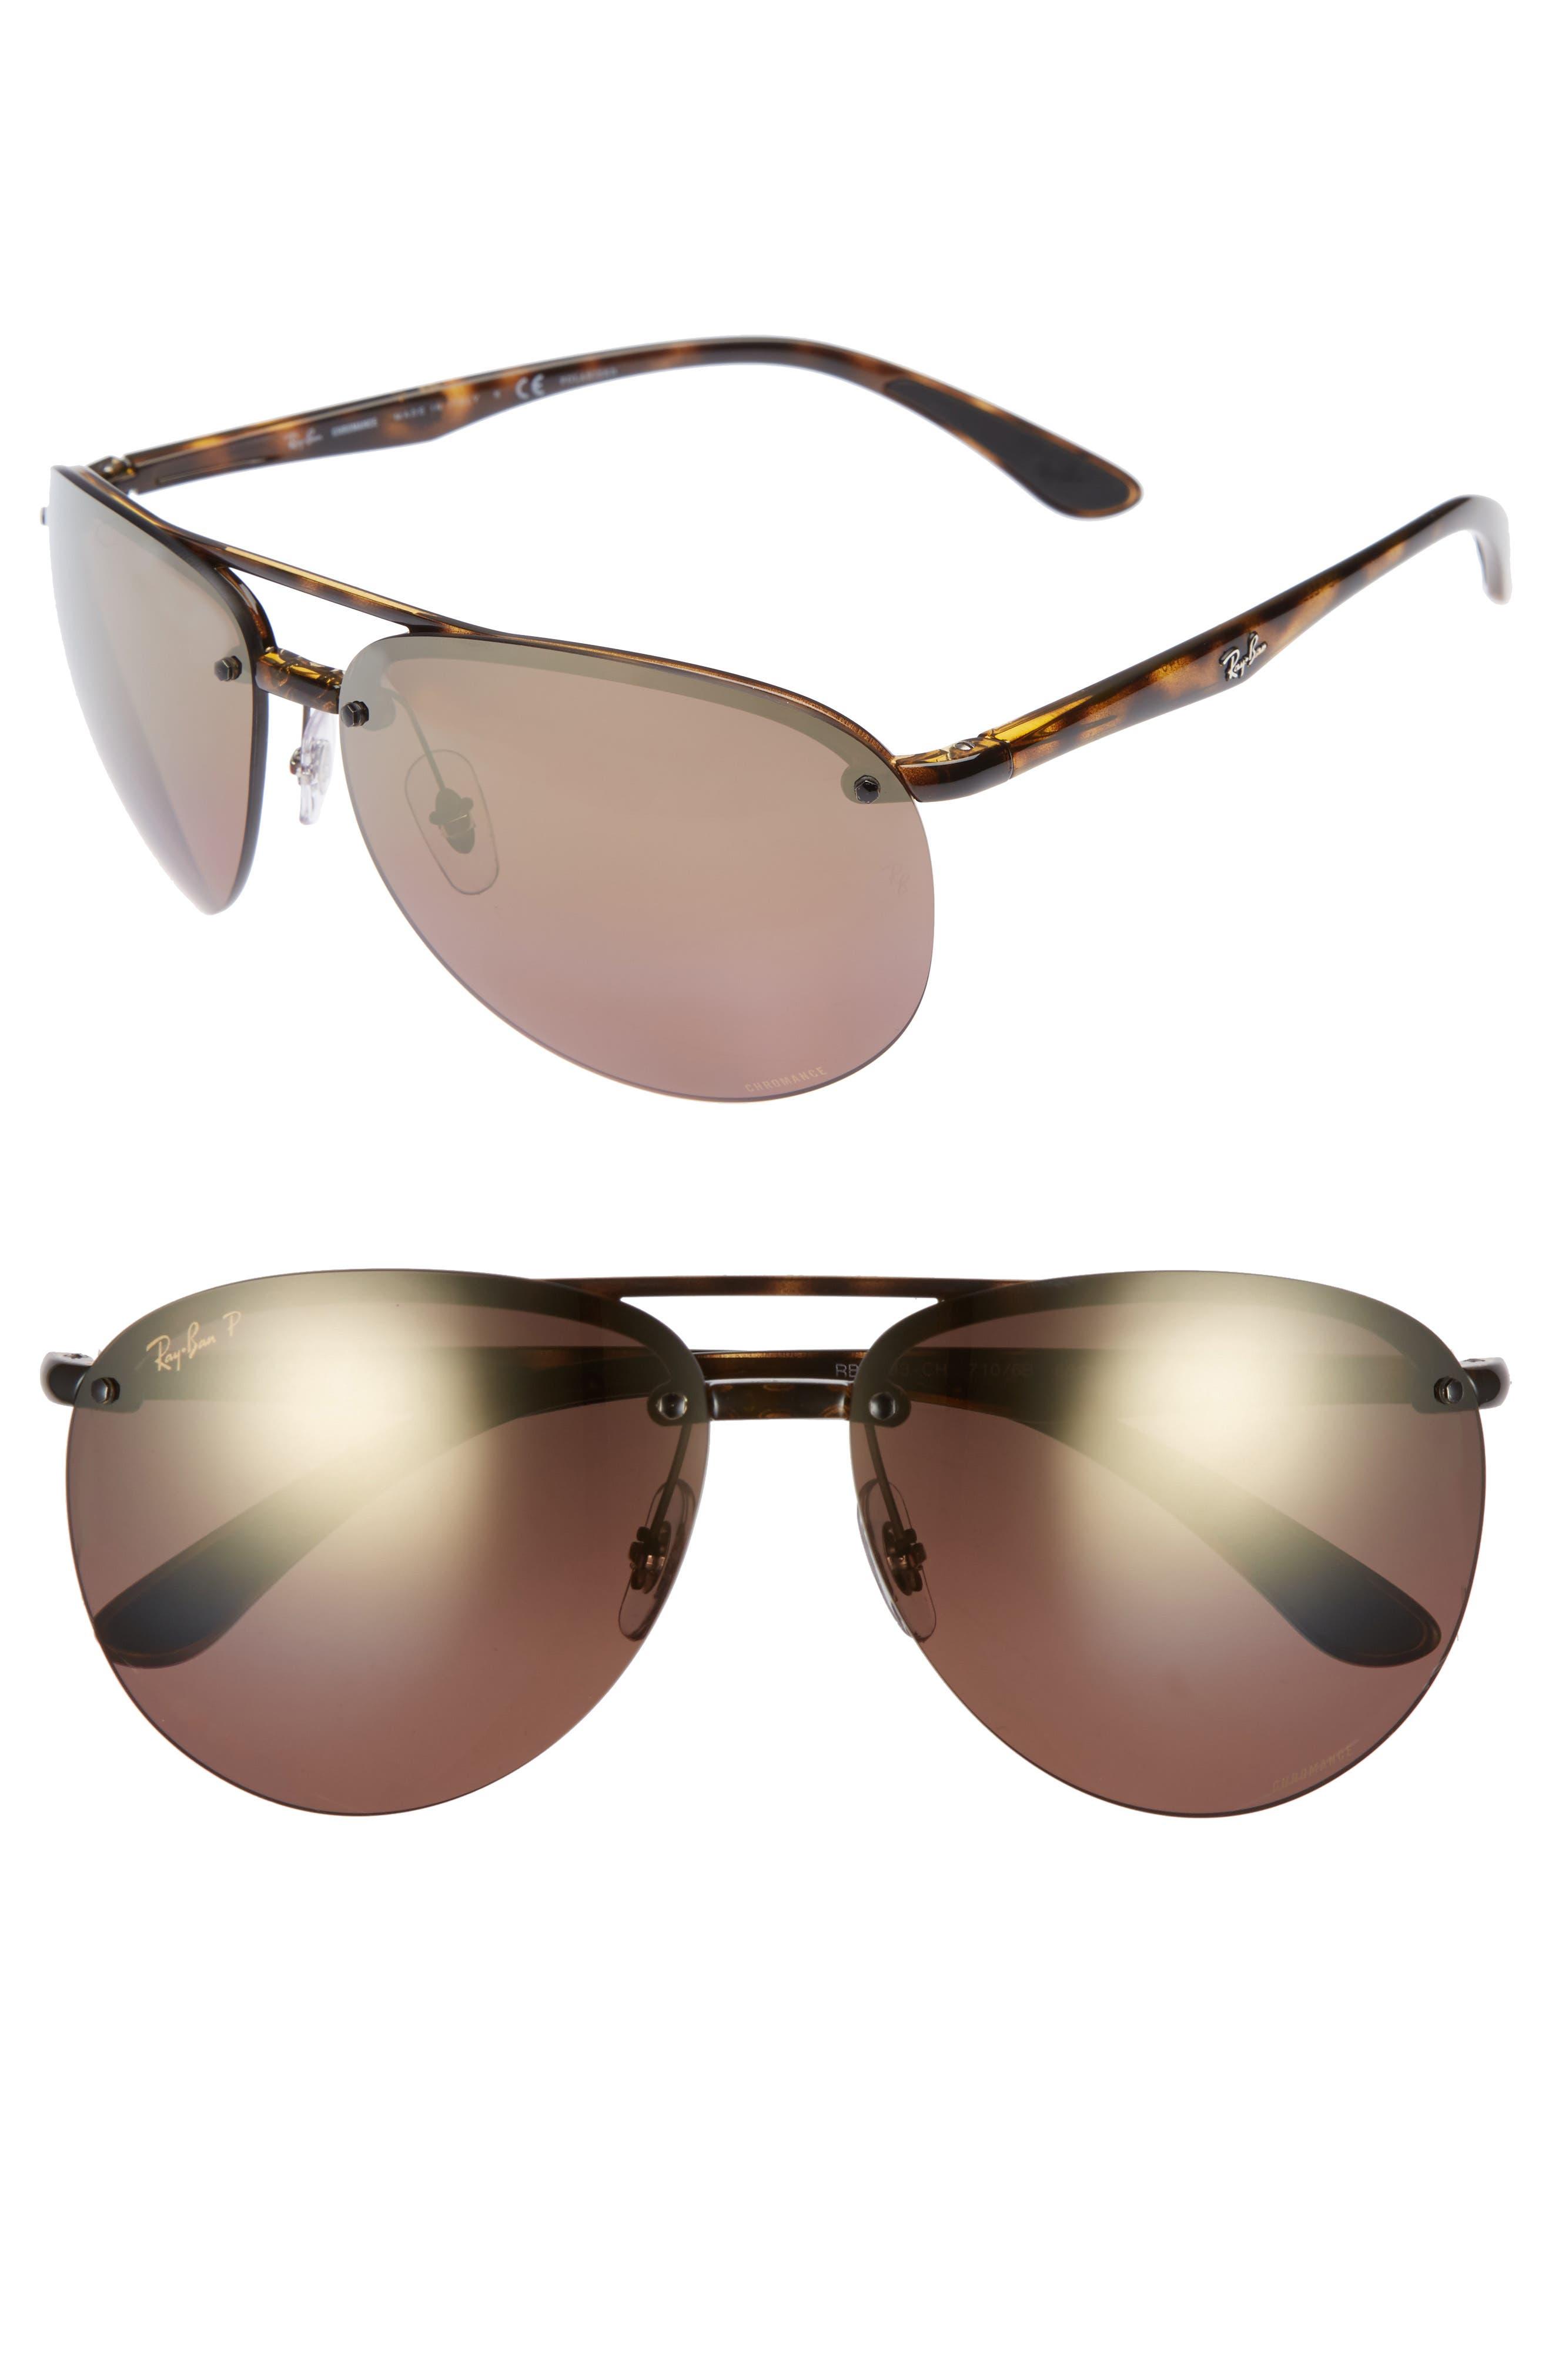 65mm Gradient Aviator Sunglasses,                             Main thumbnail 1, color,                             Havana